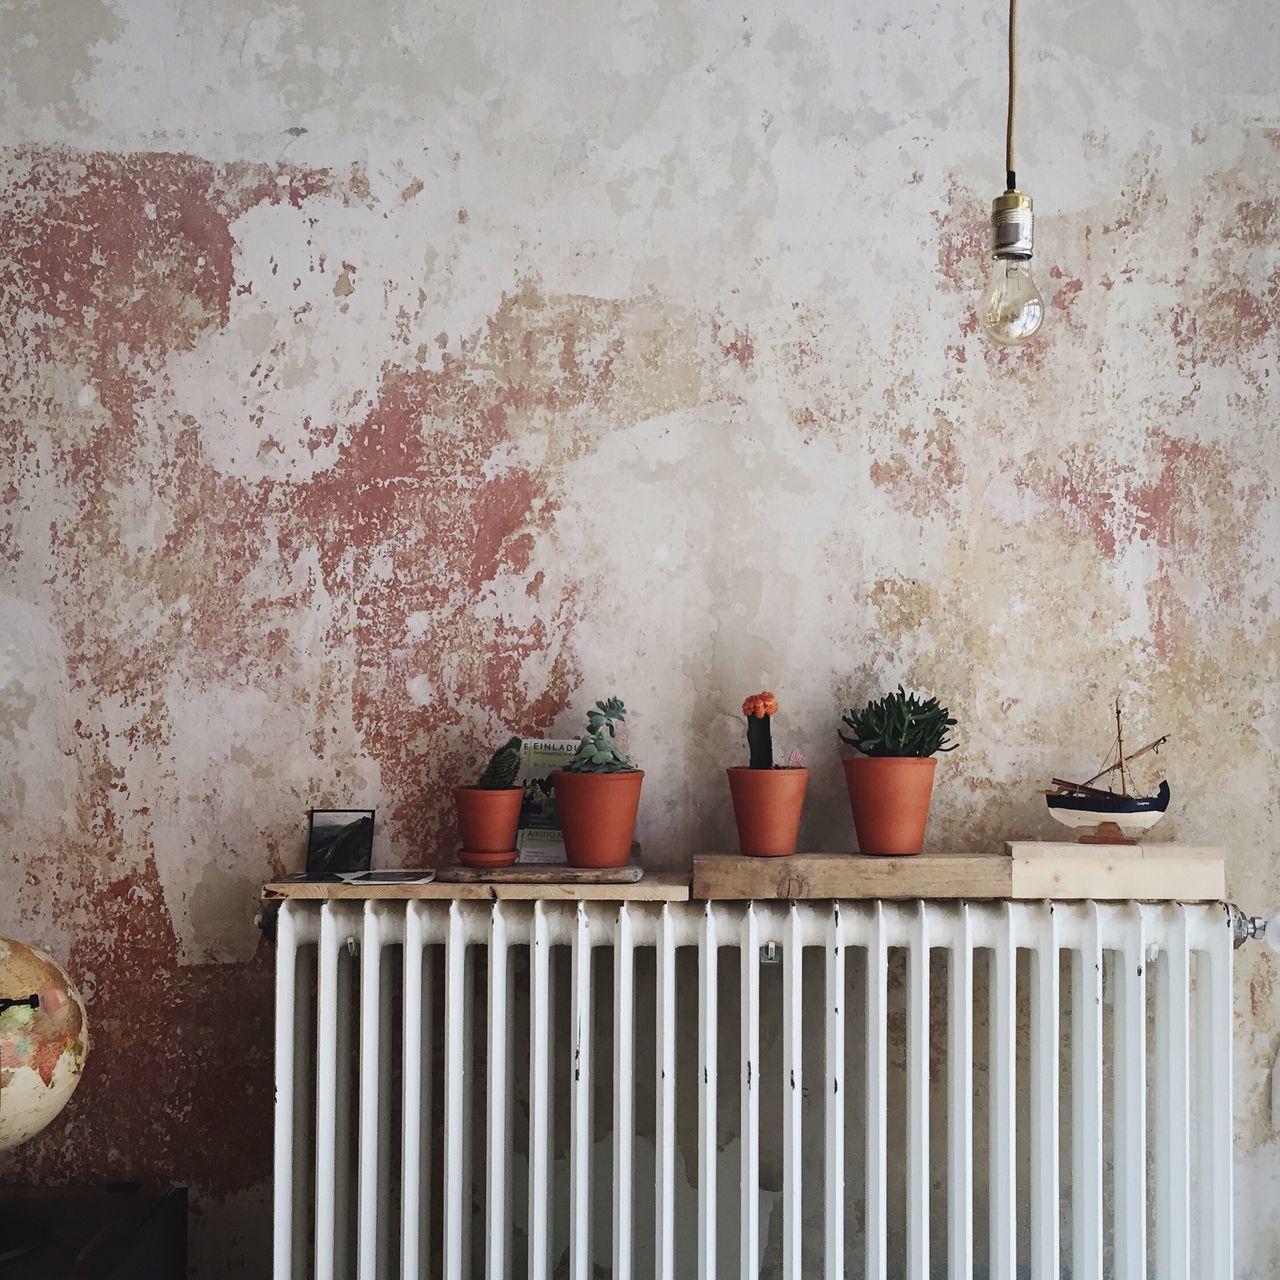 Beautiful stock photos of kaffee, Berlin, Coffee Shop, Day, Flower Pot